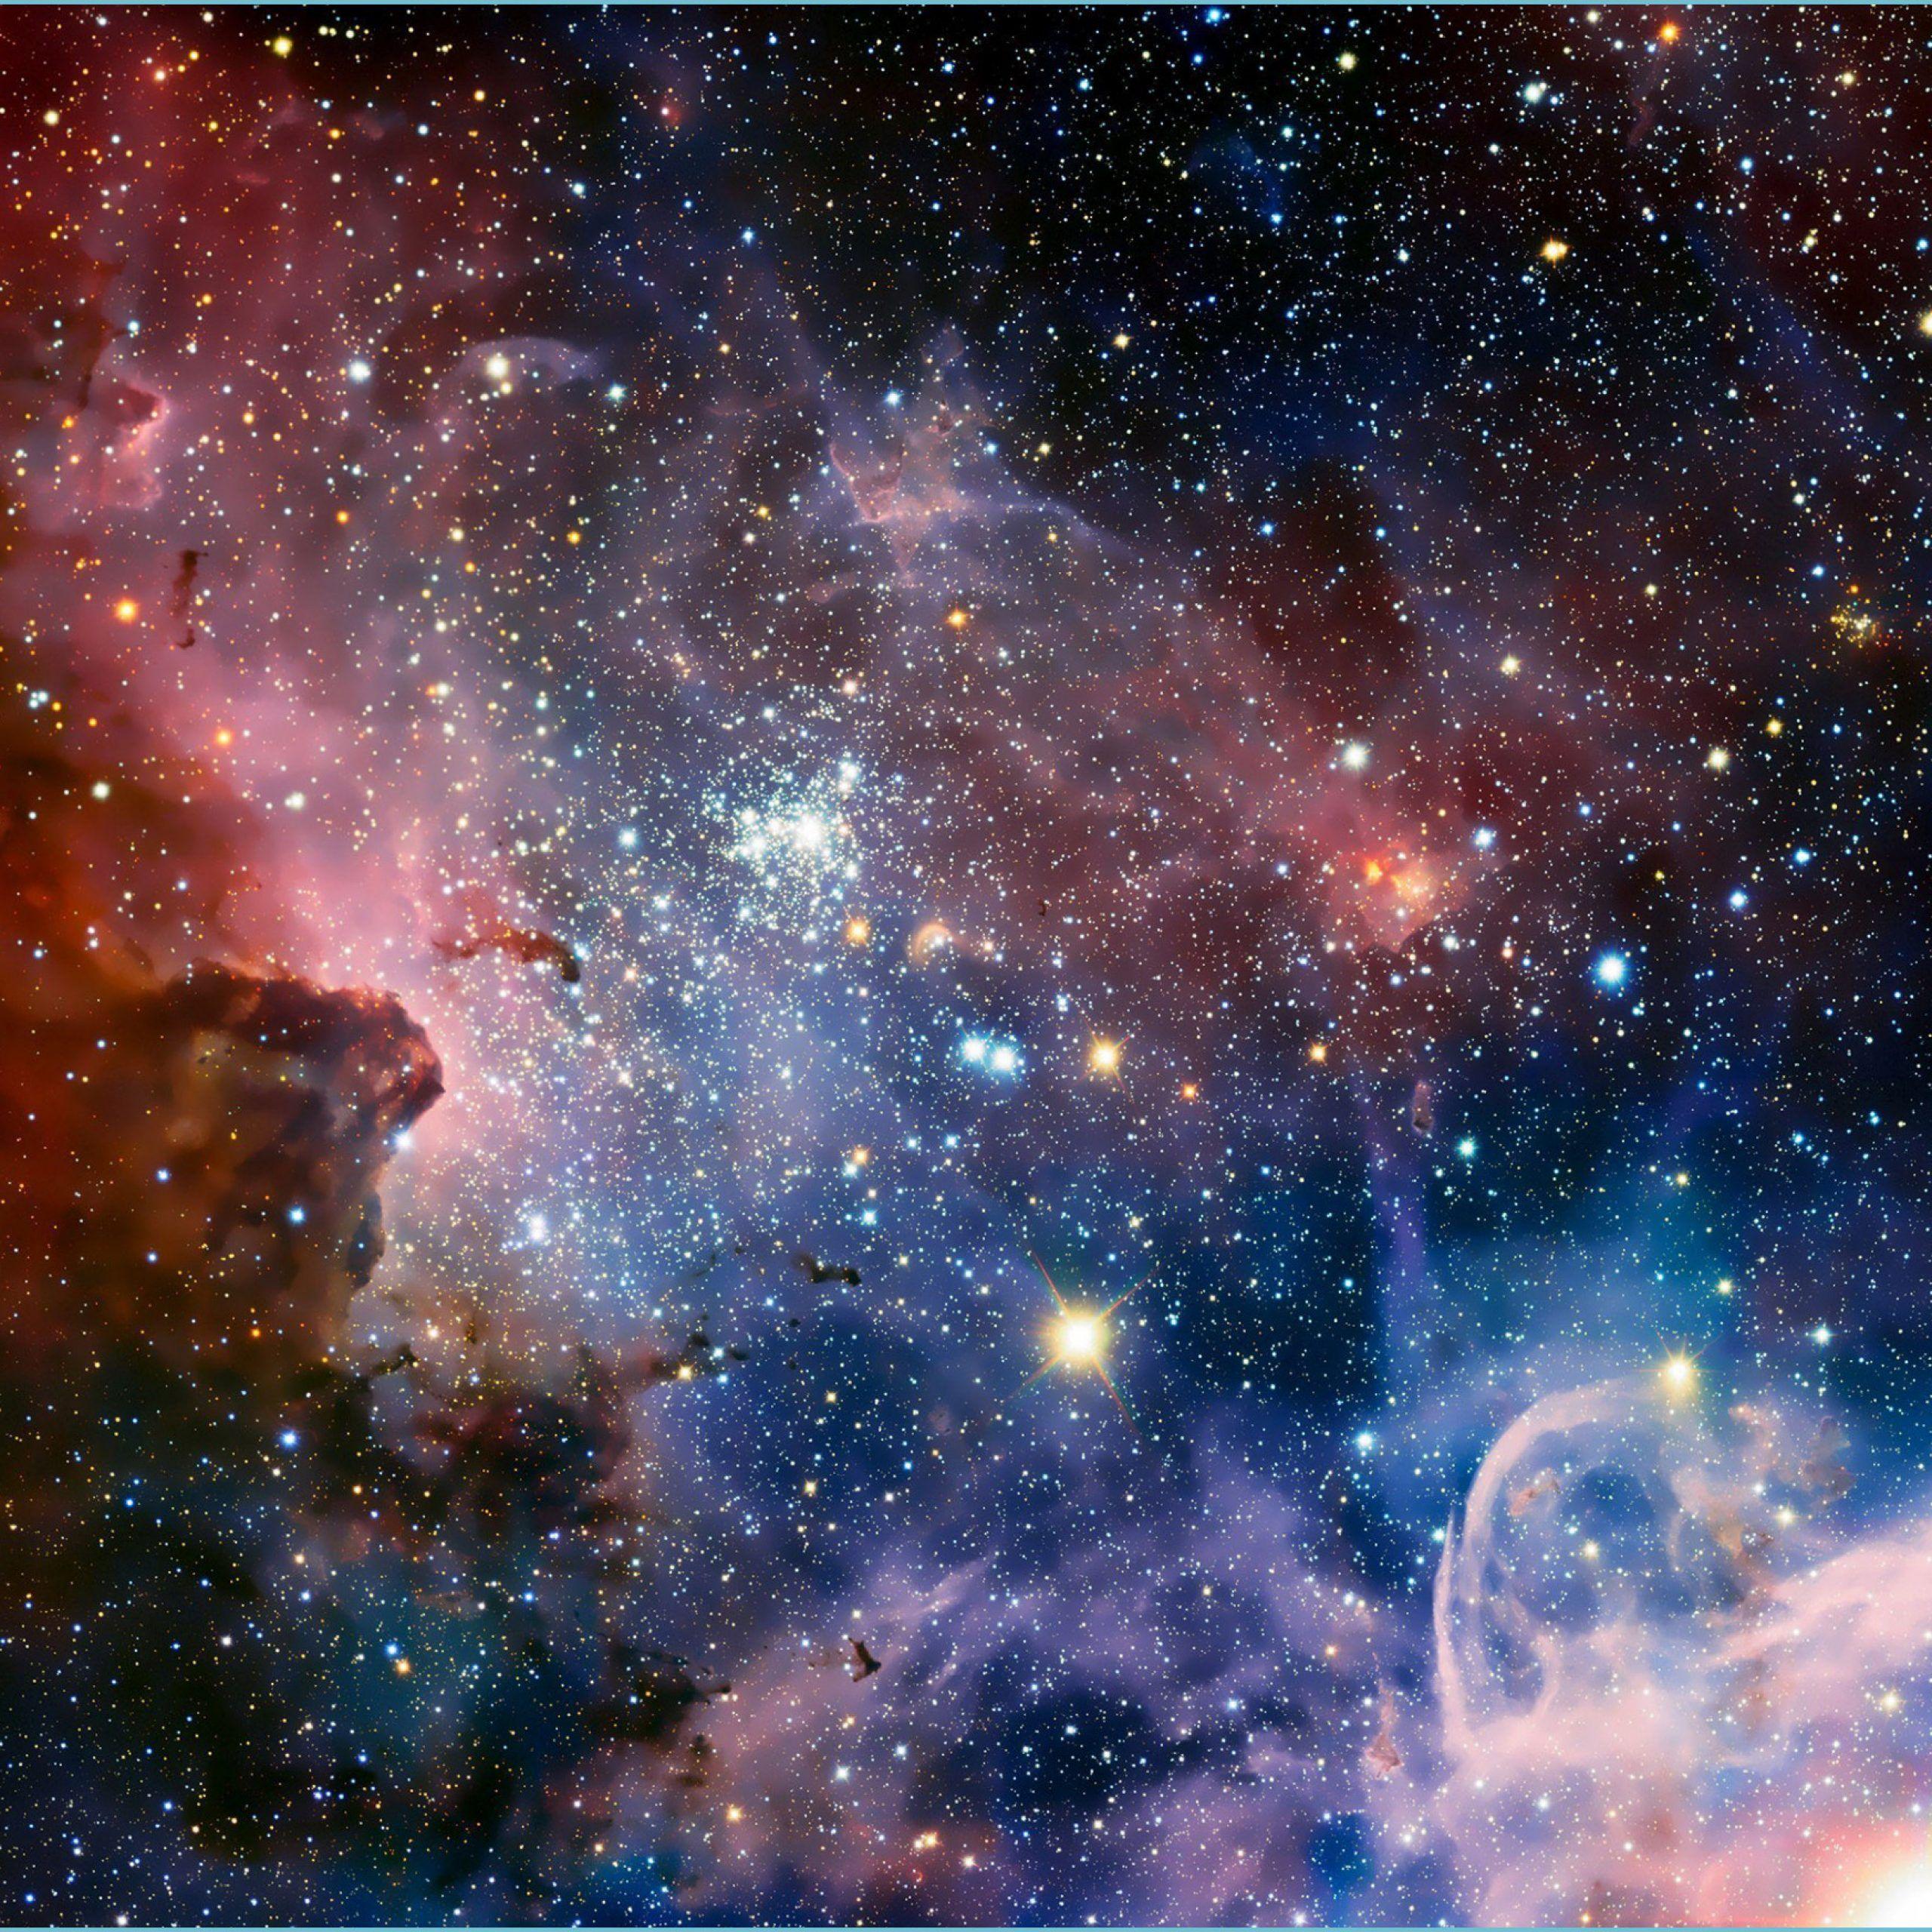 Top 9 Fantastic Experience Of This Years Galaxy Wallpaper Hd Galaxy Wallpaper Hd Hd Galaxy Wallpaper Galaxy Wallpaper Carina Nebula